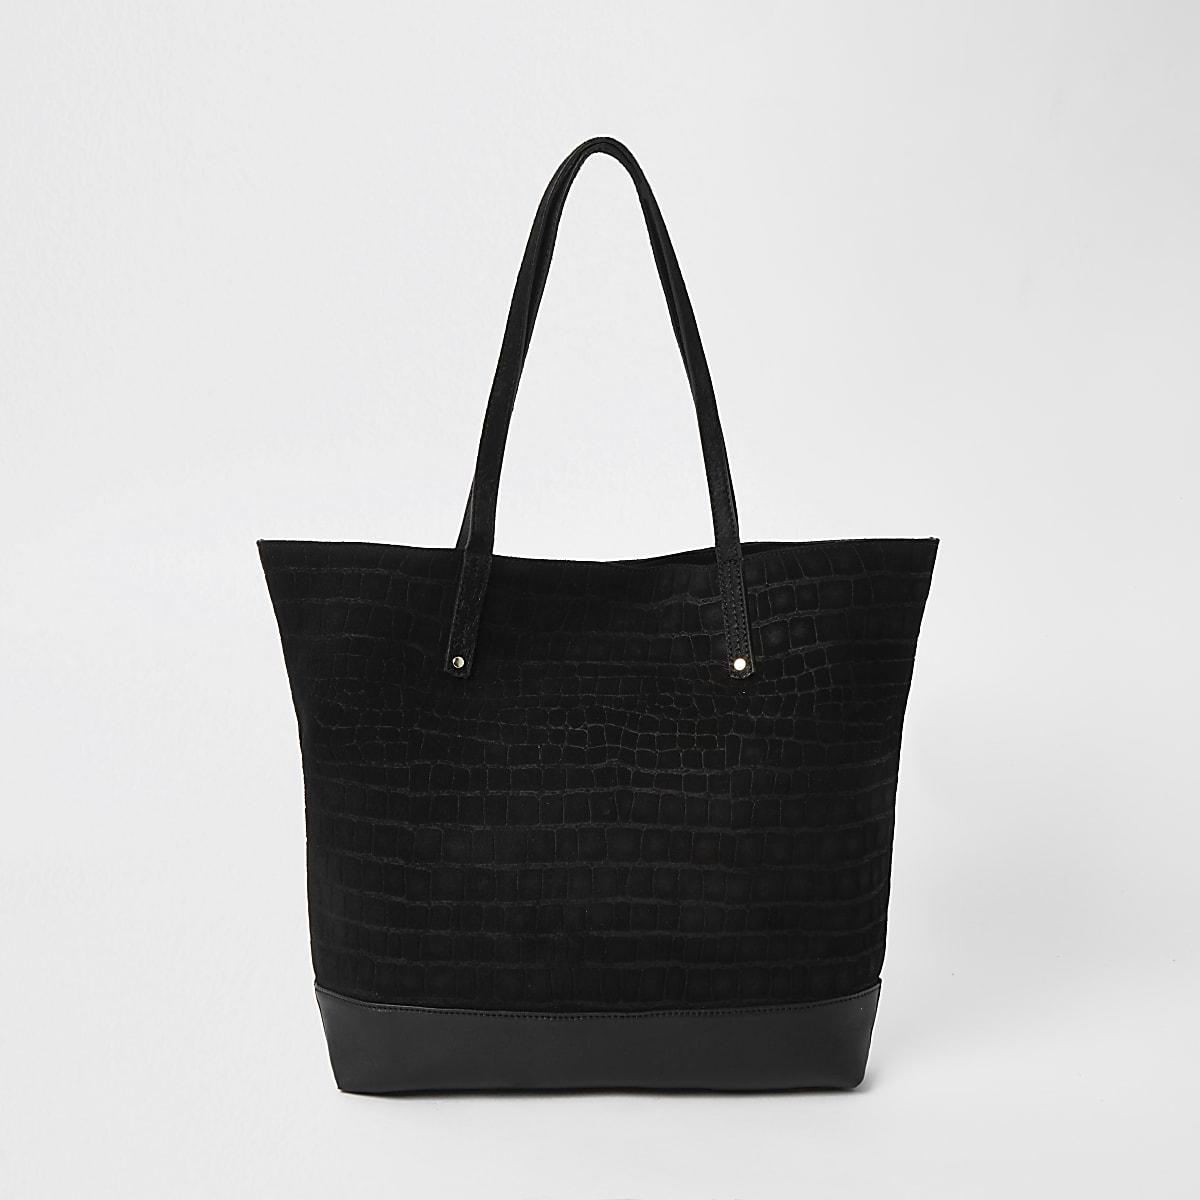 Black leather tote shopper bag